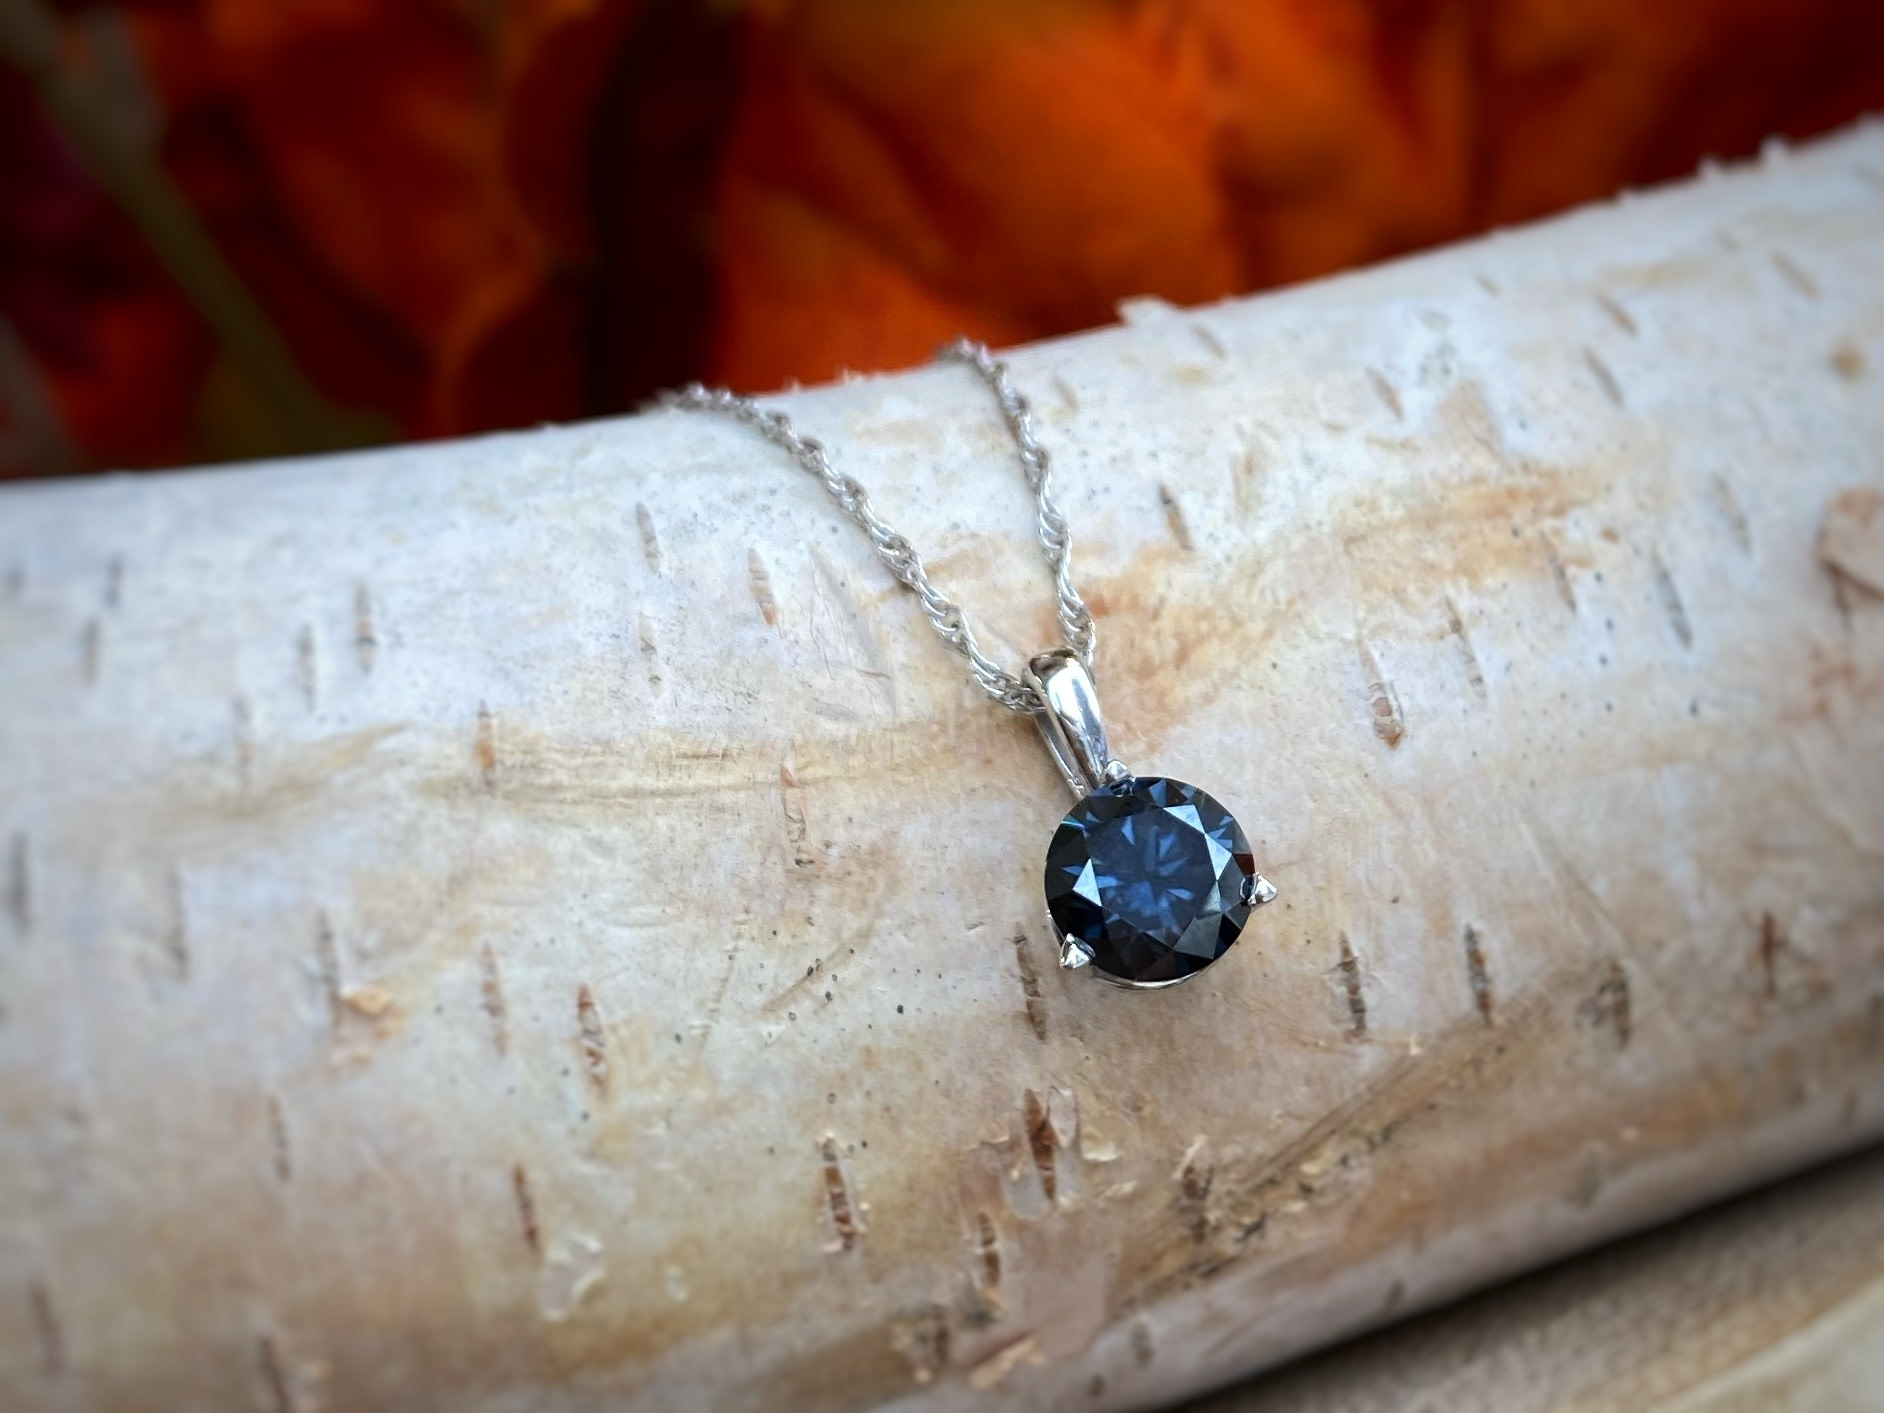 Gray Round Moissanite Pendant Necklace